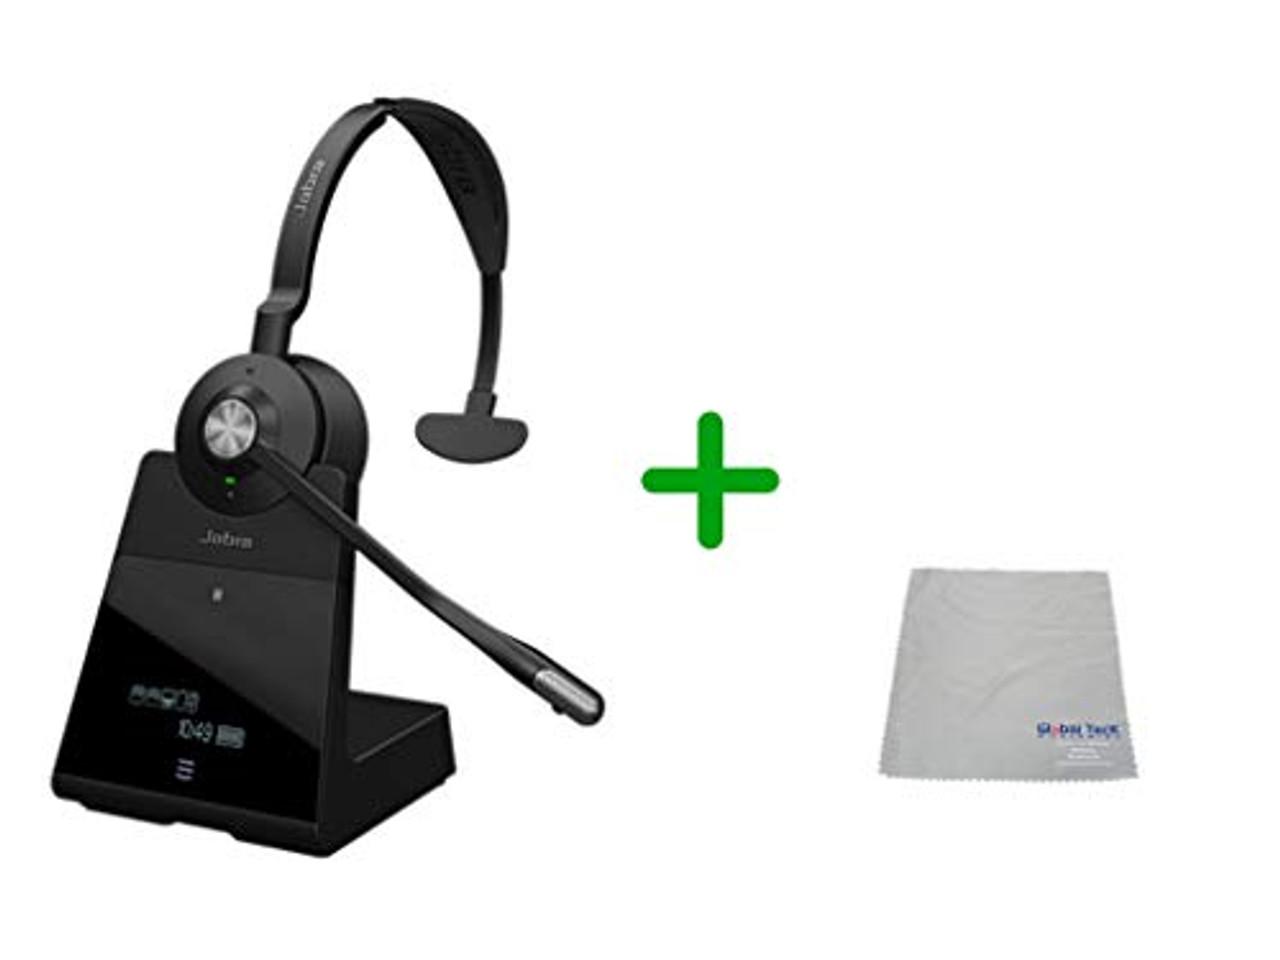 Avaya Compatible Jabra Engage 75 Wireless Mono Headset Bundle 9556 583 125 Ava C Bluetooth Phones Pc Mac Usb Select Avaya Desk Phones Compatible Vantage Series K155 K165 K175 Busy Light Global Teck